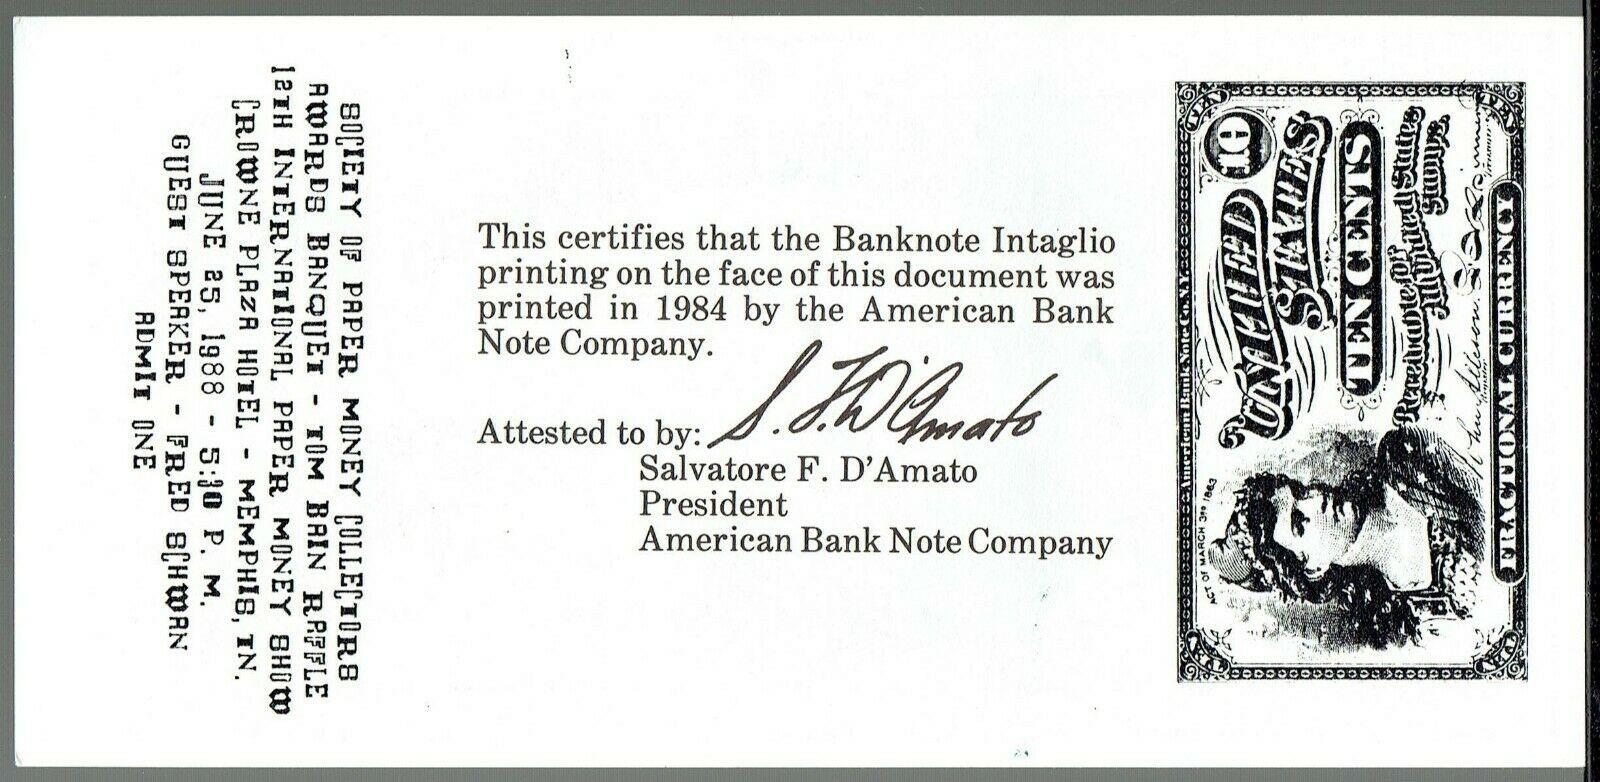 SO-37 1988 SMPC ticket back.jpg